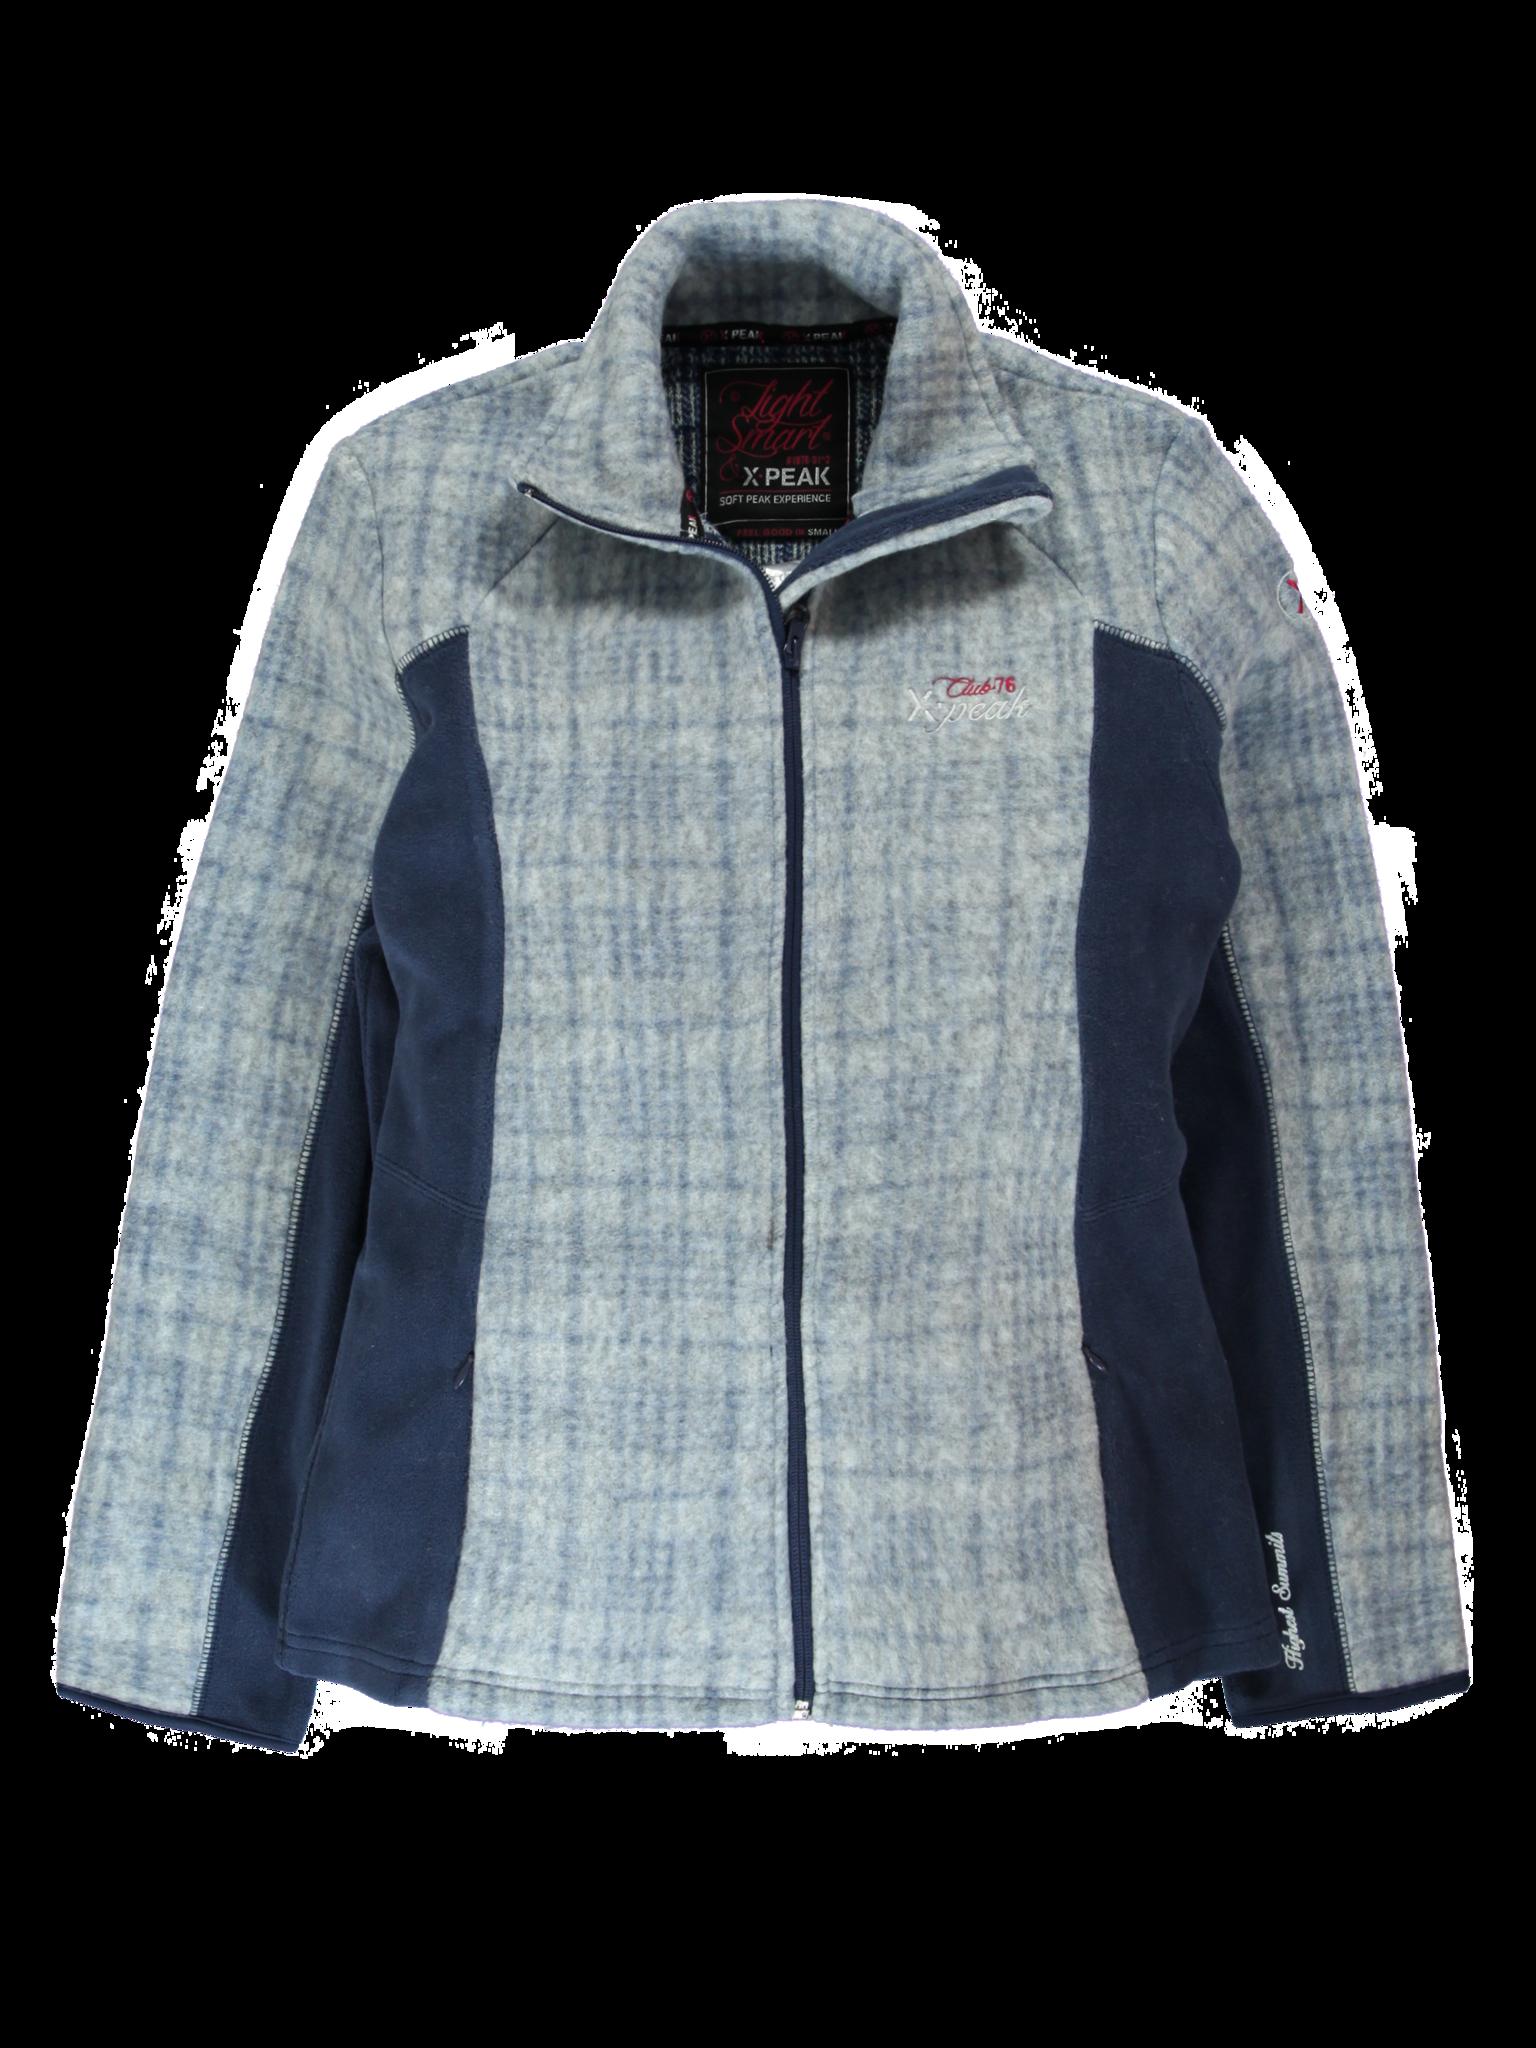 All Brands | Winterproducts Ladies | Cardigan Sweater | 16 pcs/box